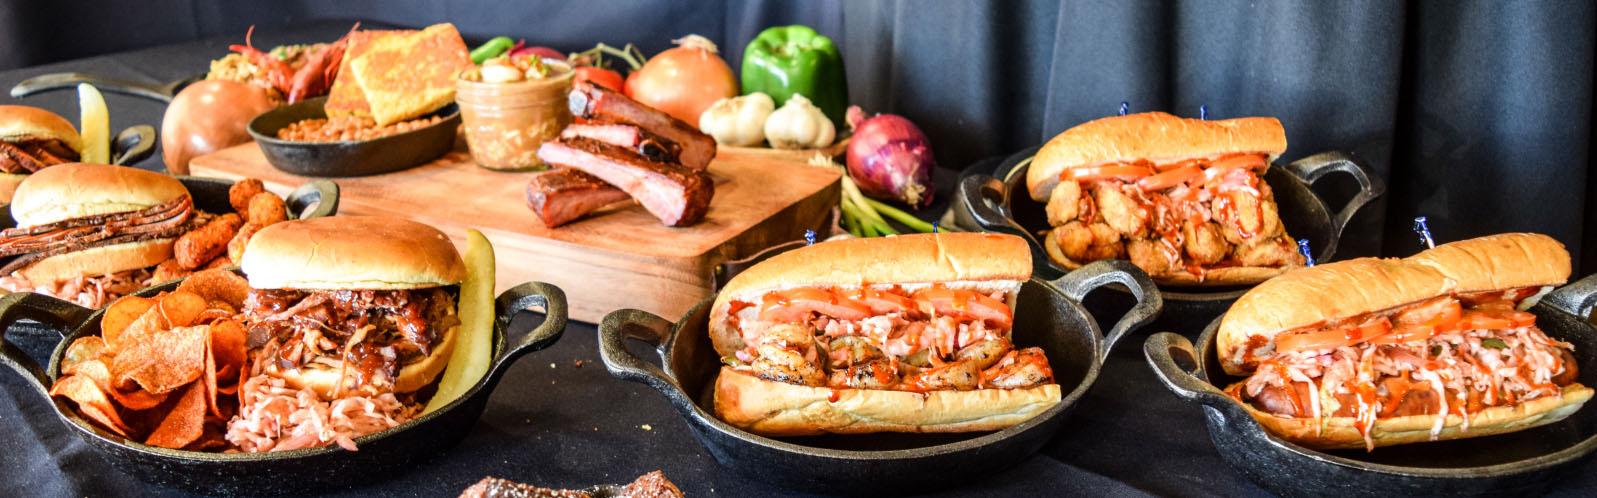 Cajun And Barbecue Restaurant